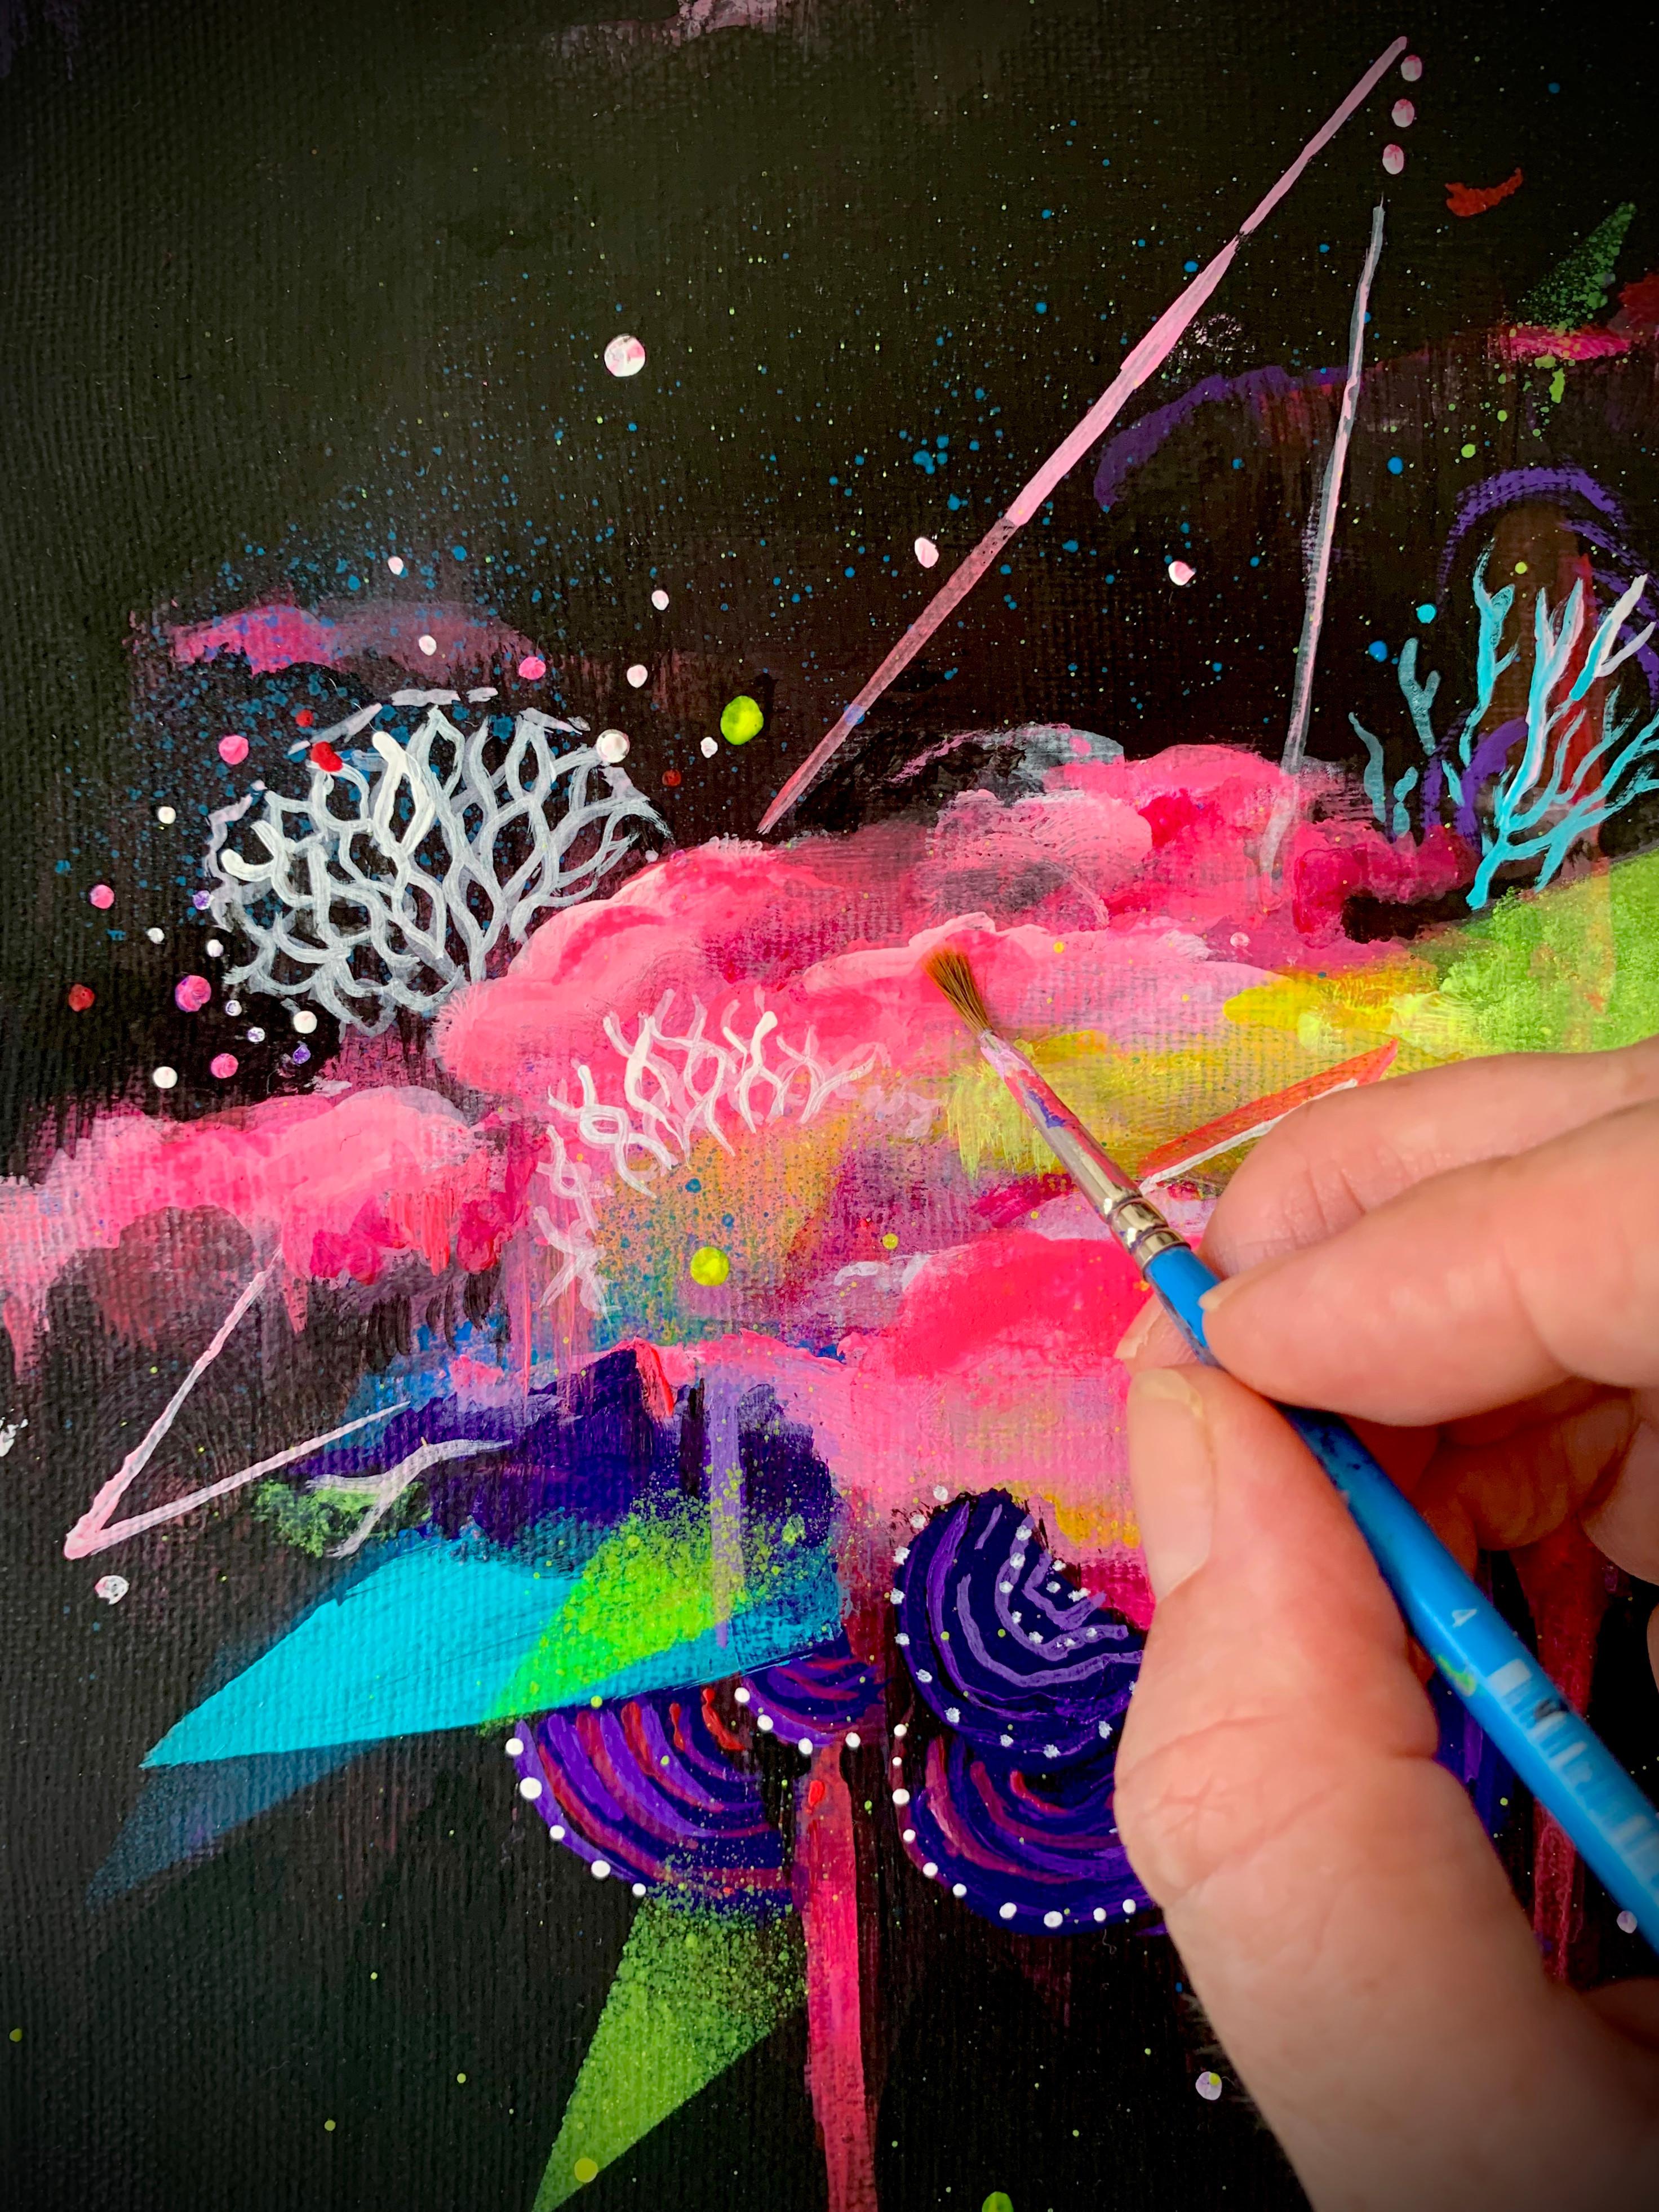 Cosmic Art Session